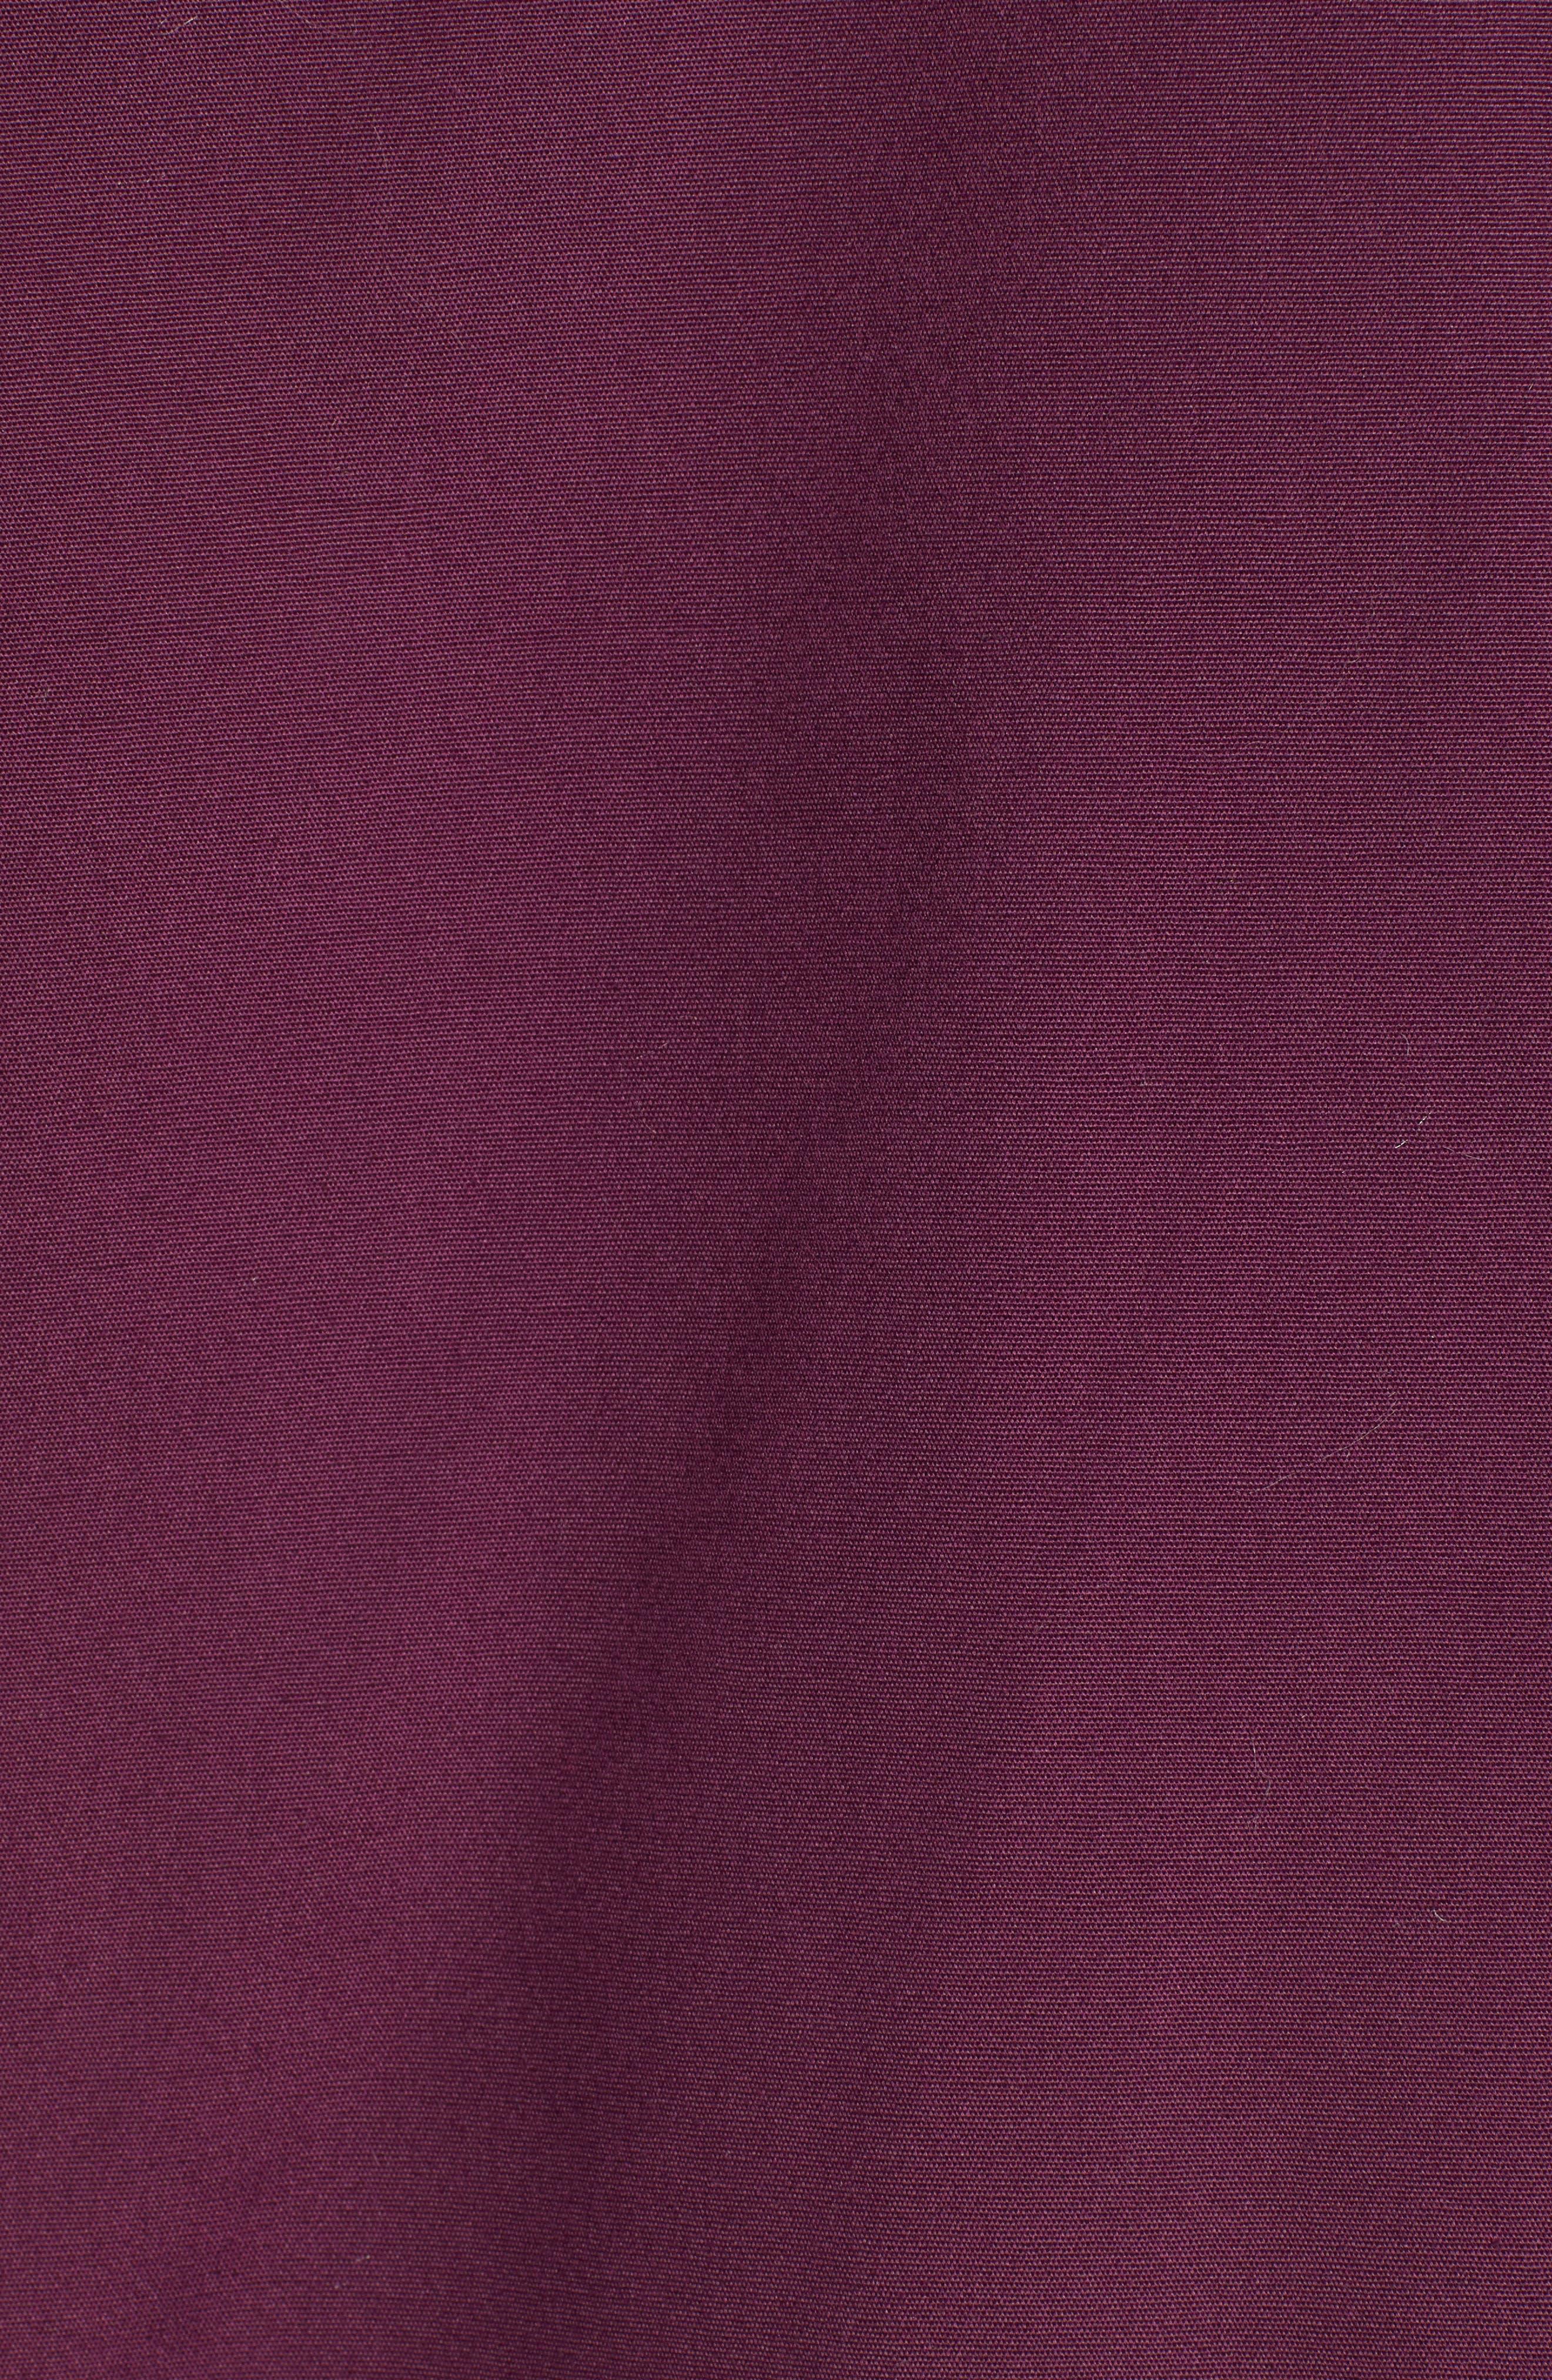 JOULES,                             Right as Rain Waterproof Hooded Jacket,                             Alternate thumbnail 7, color,                             930